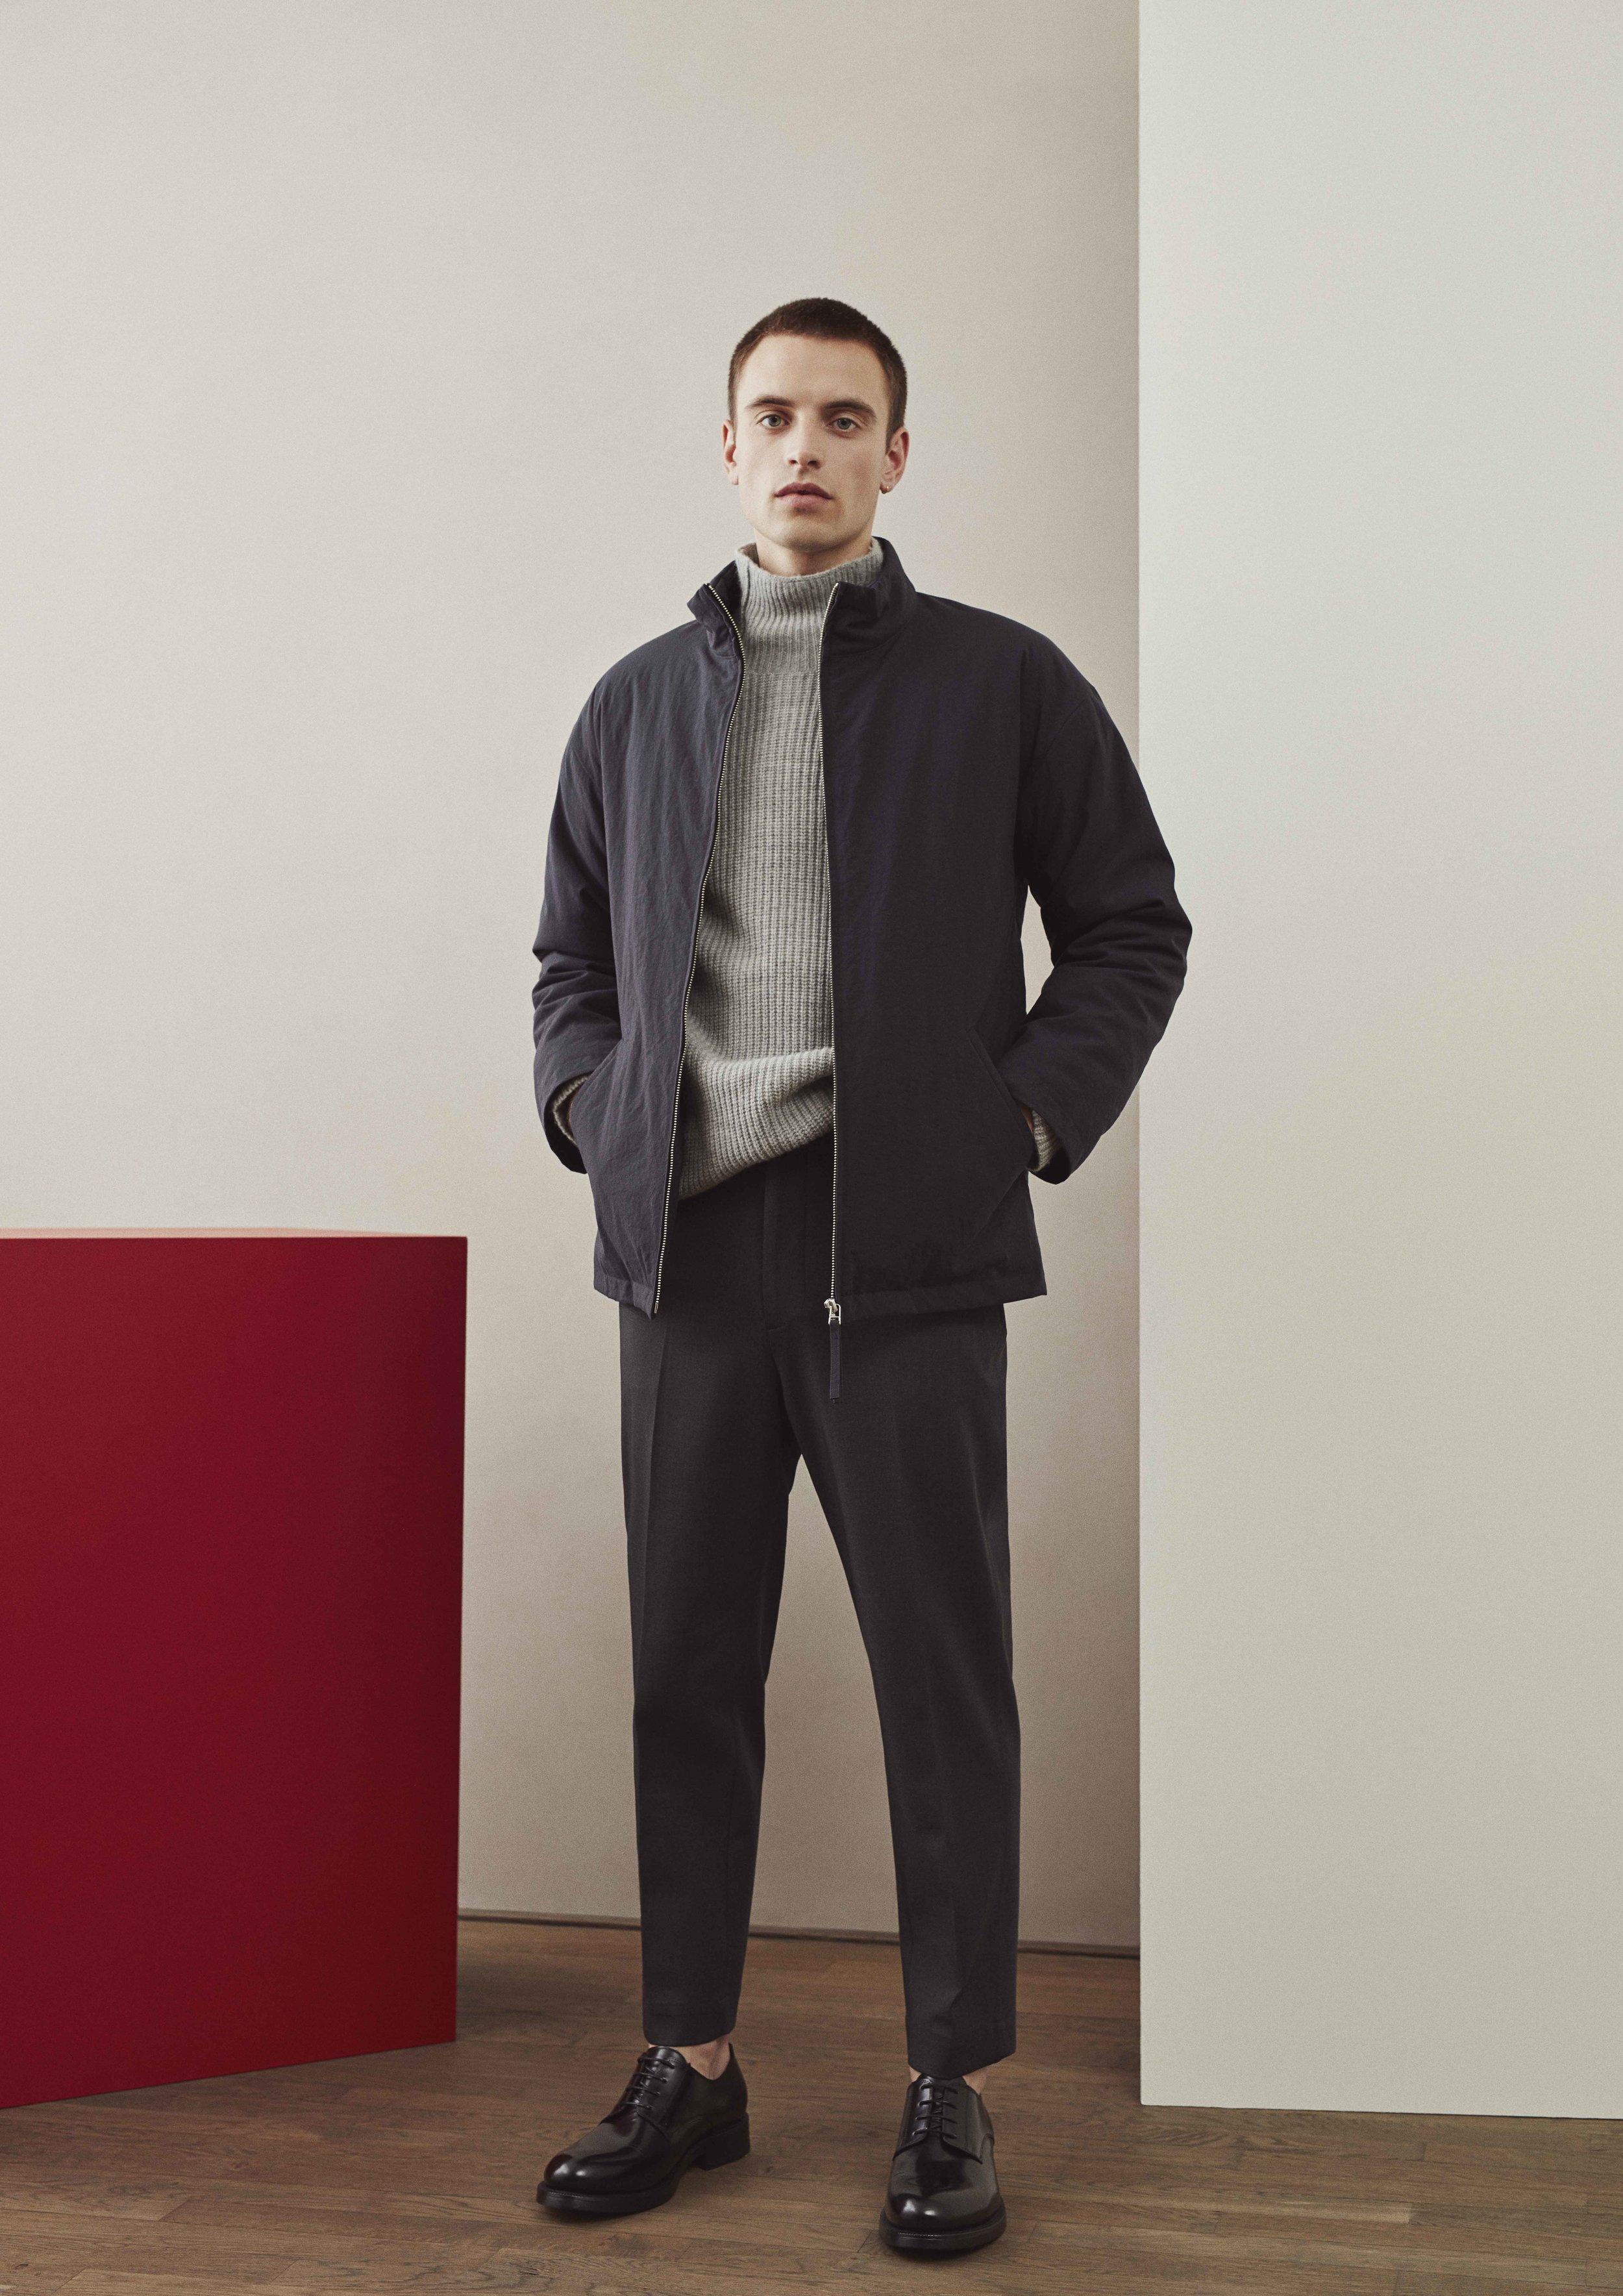 <b>1</b><br>Anker Nylon Jacket<br>Olle Alpaca Wool Sweater<br>Albert Cotton Pants